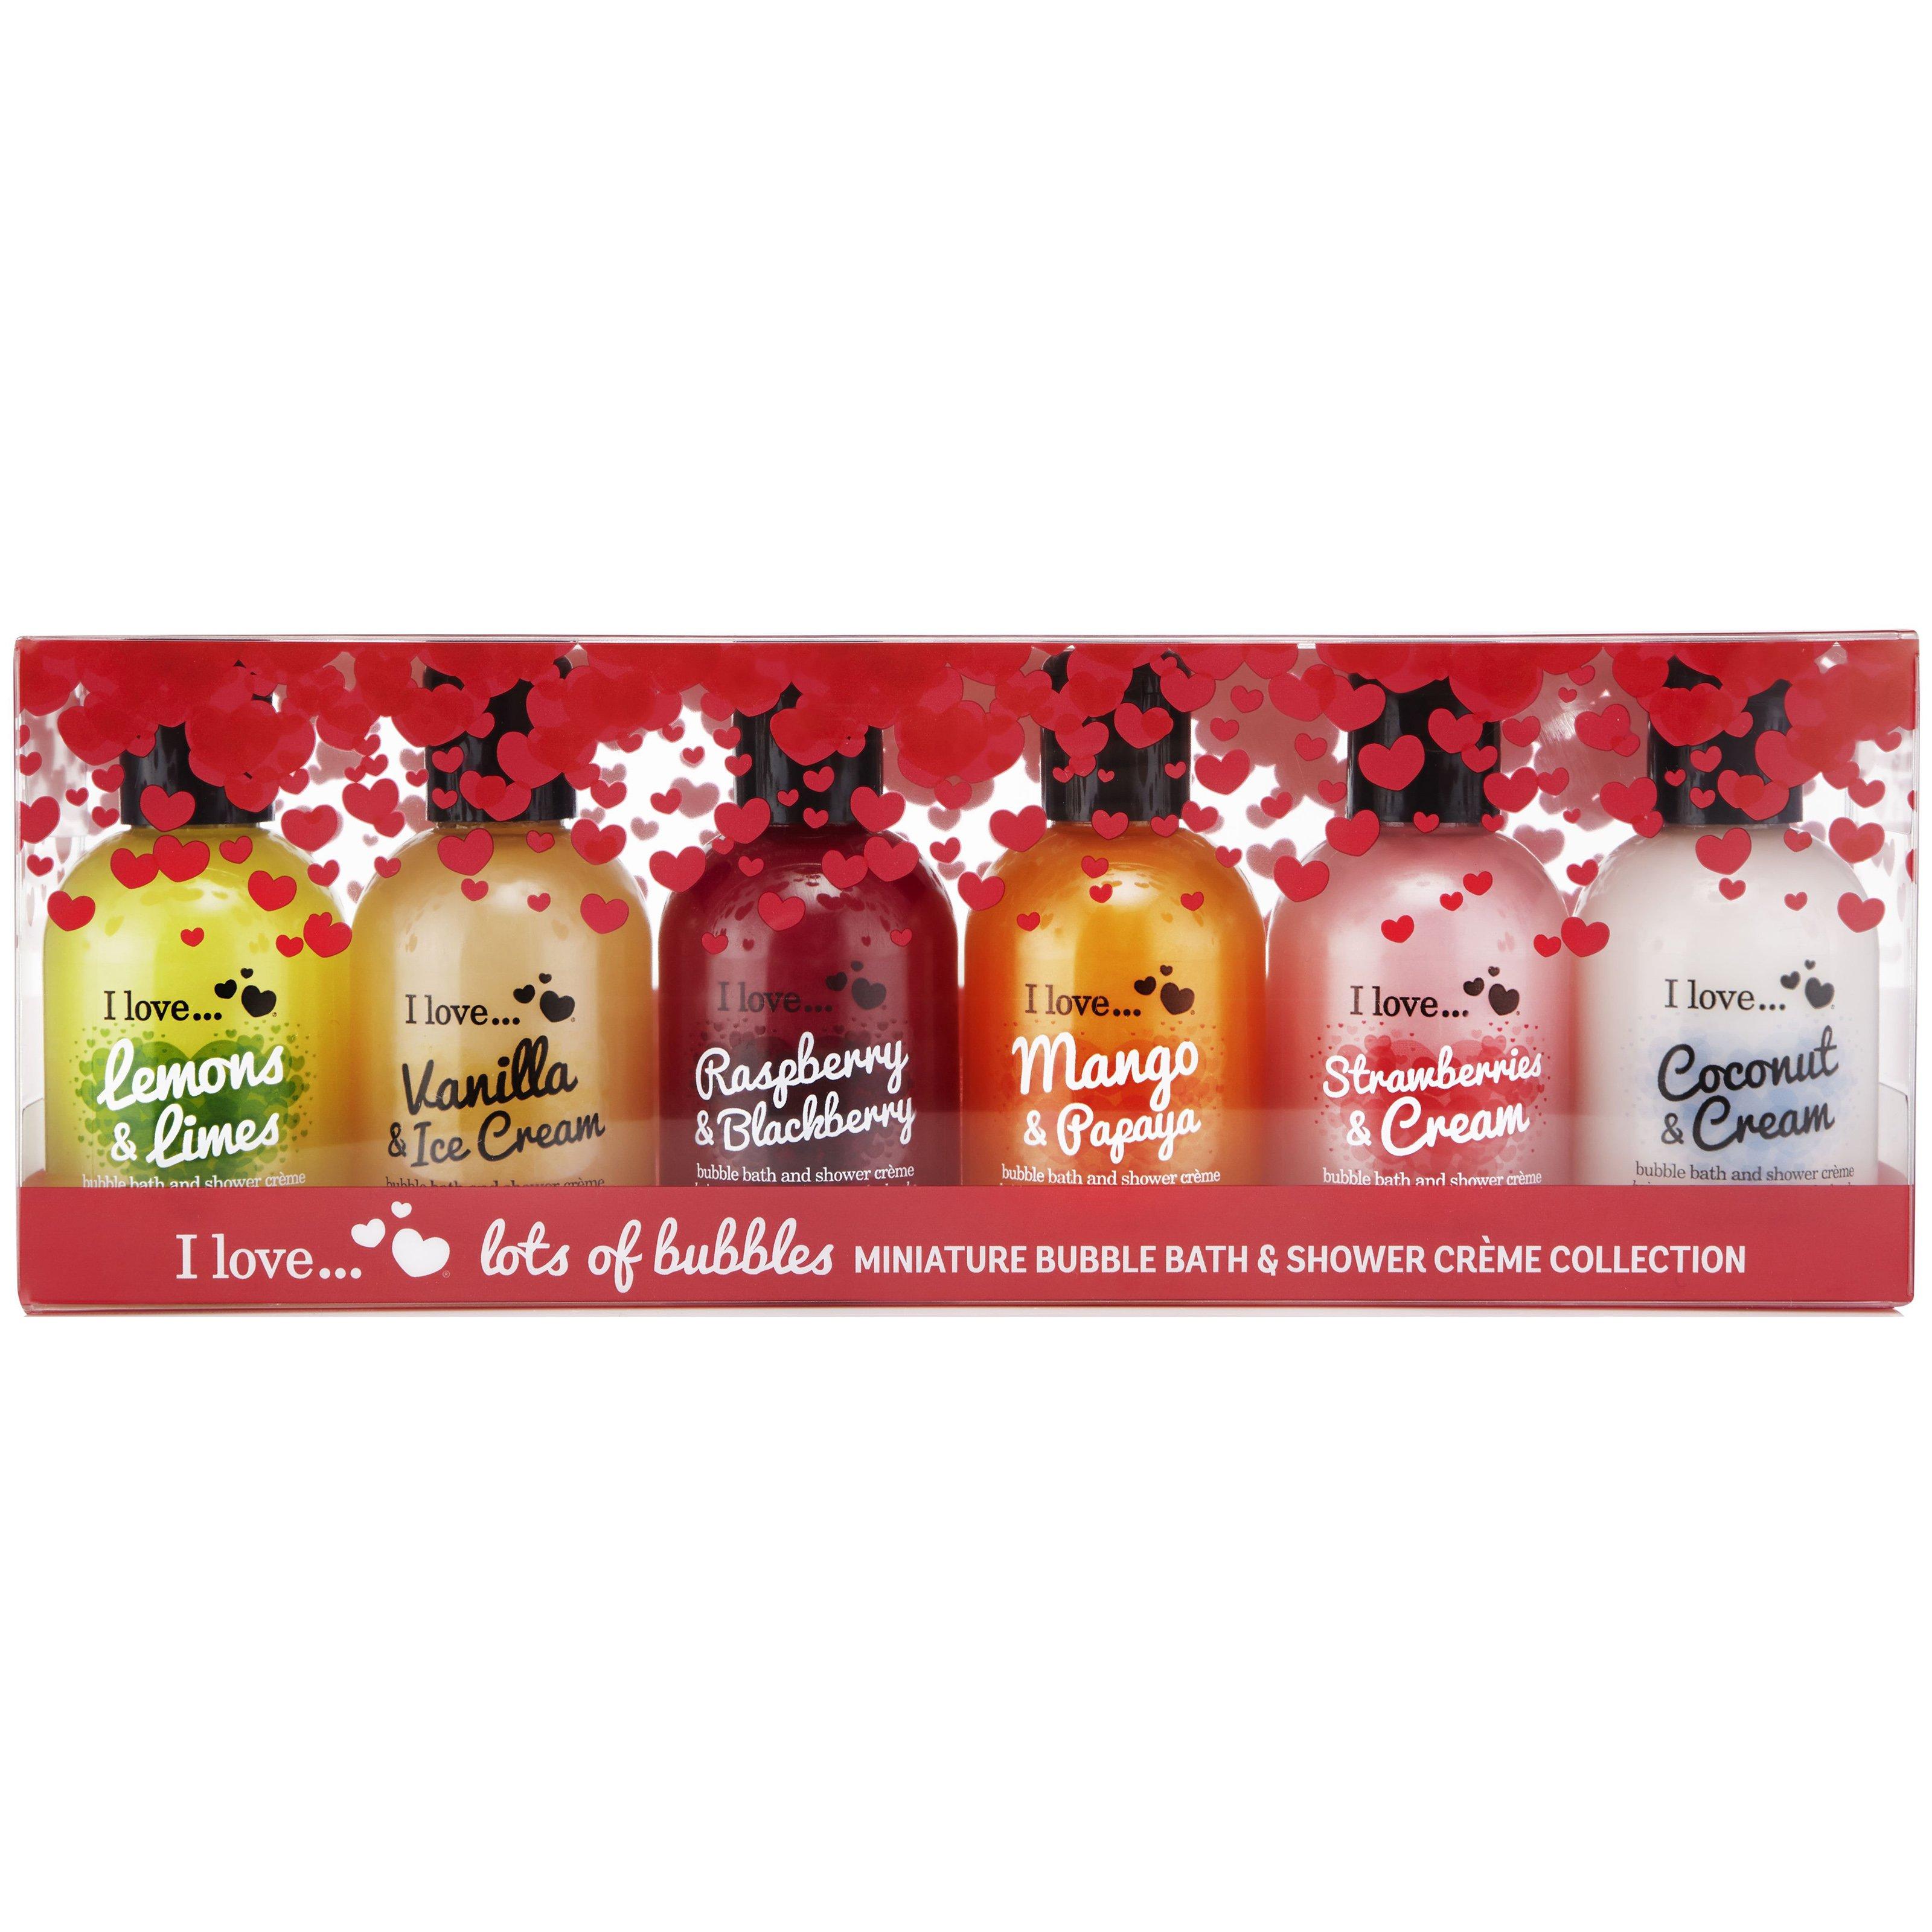 I love…Bath & Shower Coconut-Cream,Strawberries-Cream,Mango-Papaya,Raspberry-Blackberry,Vanilla-Ice Cream,Lemons-Limes 6x100ml